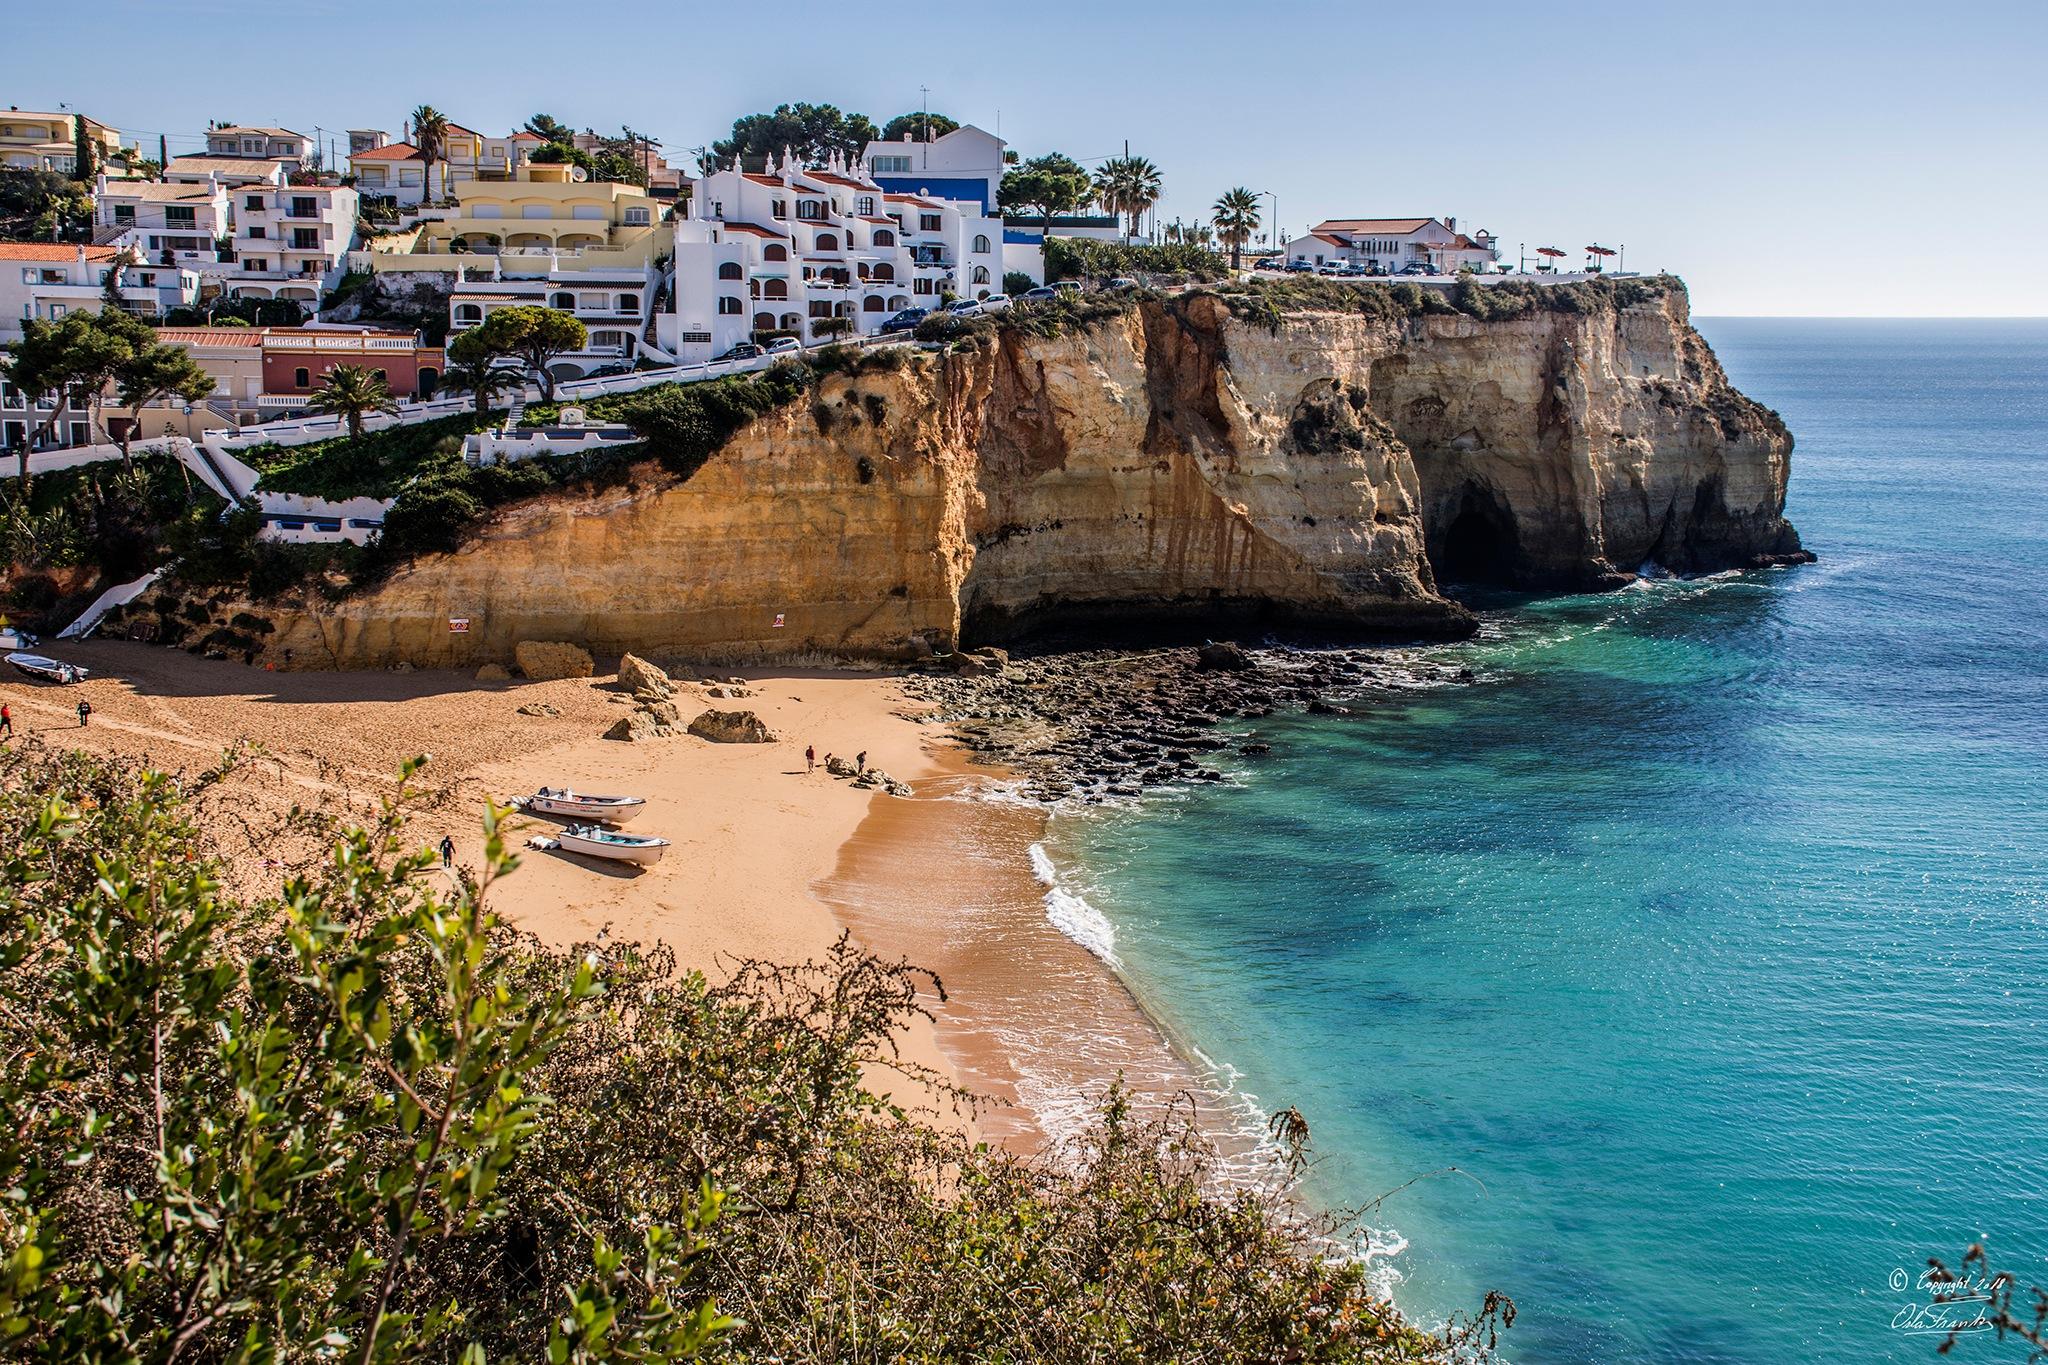 Beach Cavoeiro, Algarve by Orla Frank